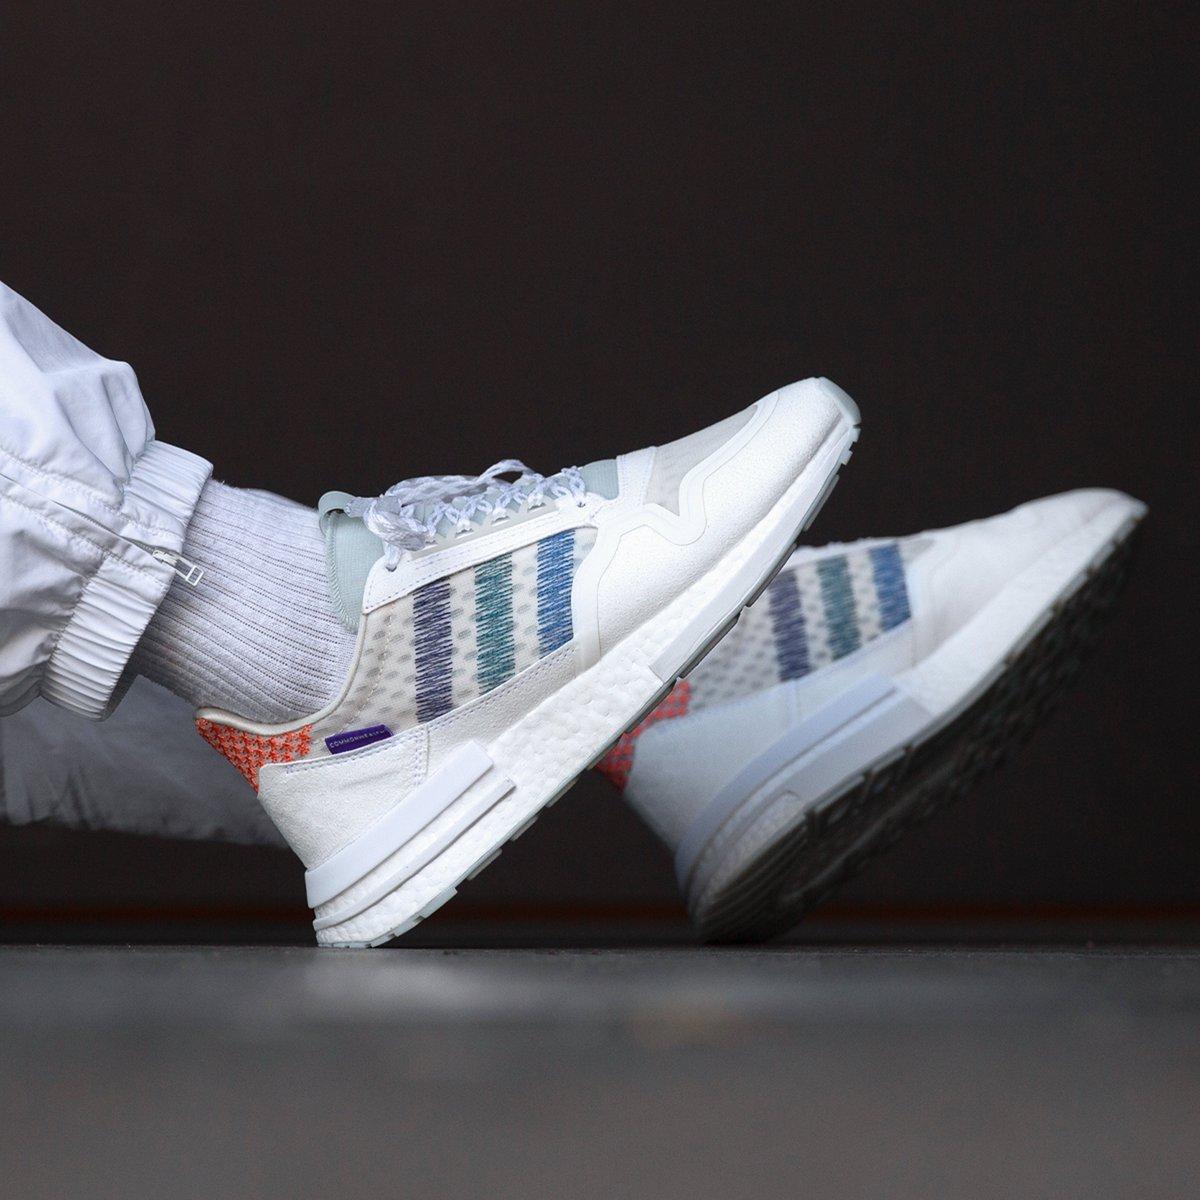 adidas originals zx 500 x commonwealth